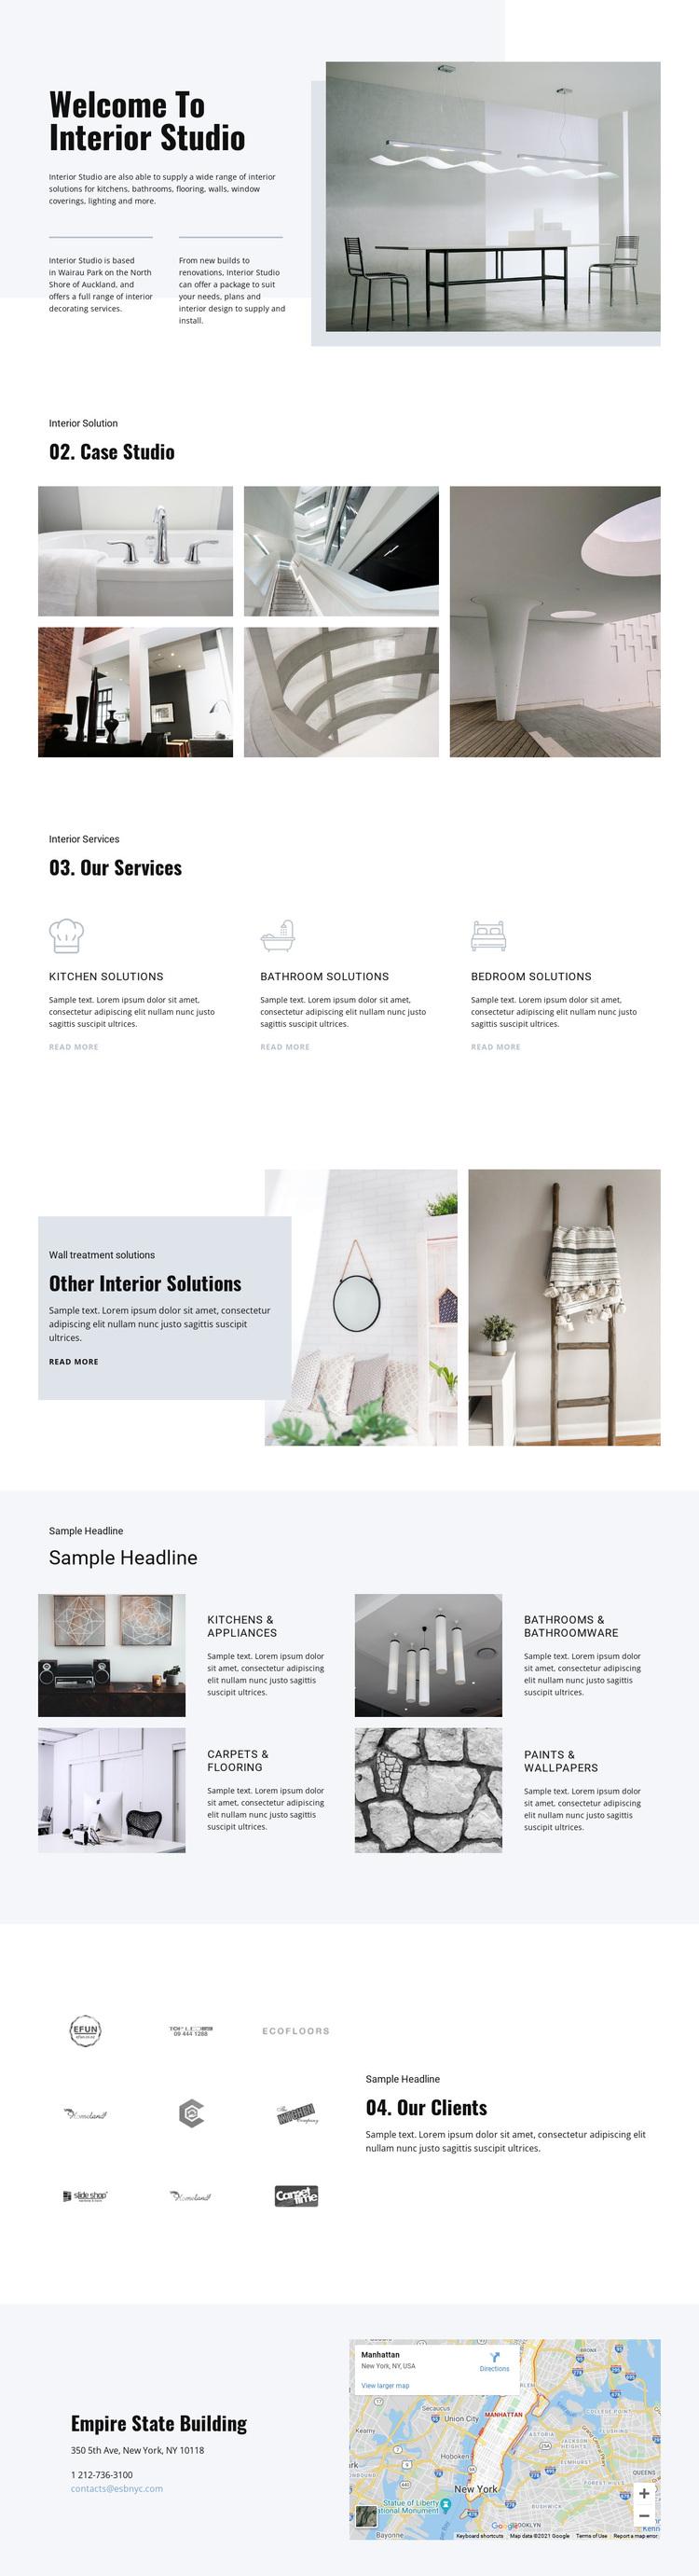 Welcome to interior studio Joomla Page Builder